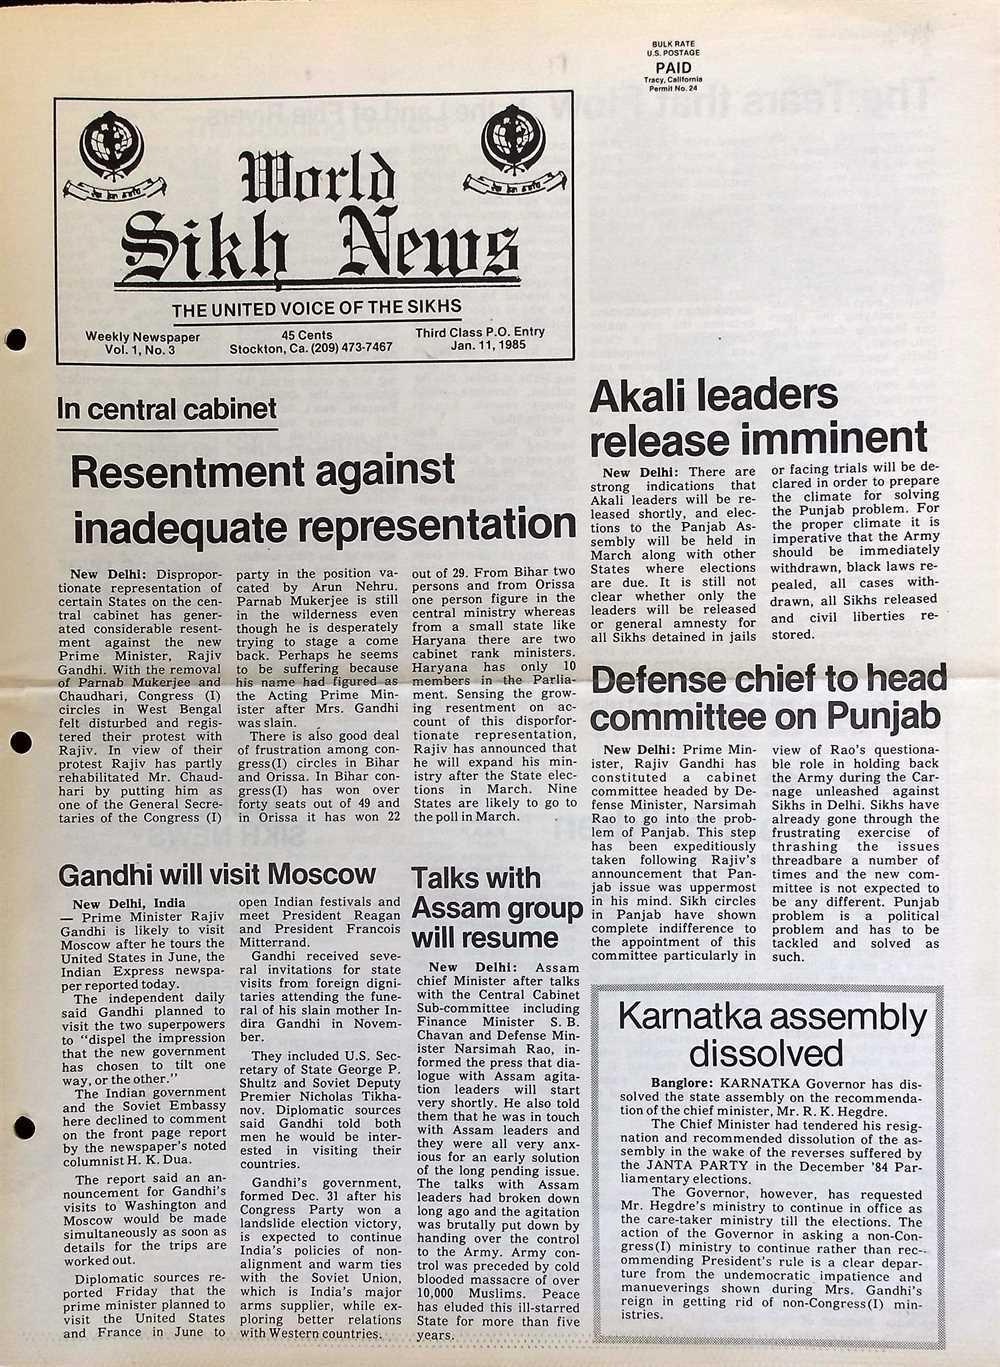 JANUARY 11, 1985